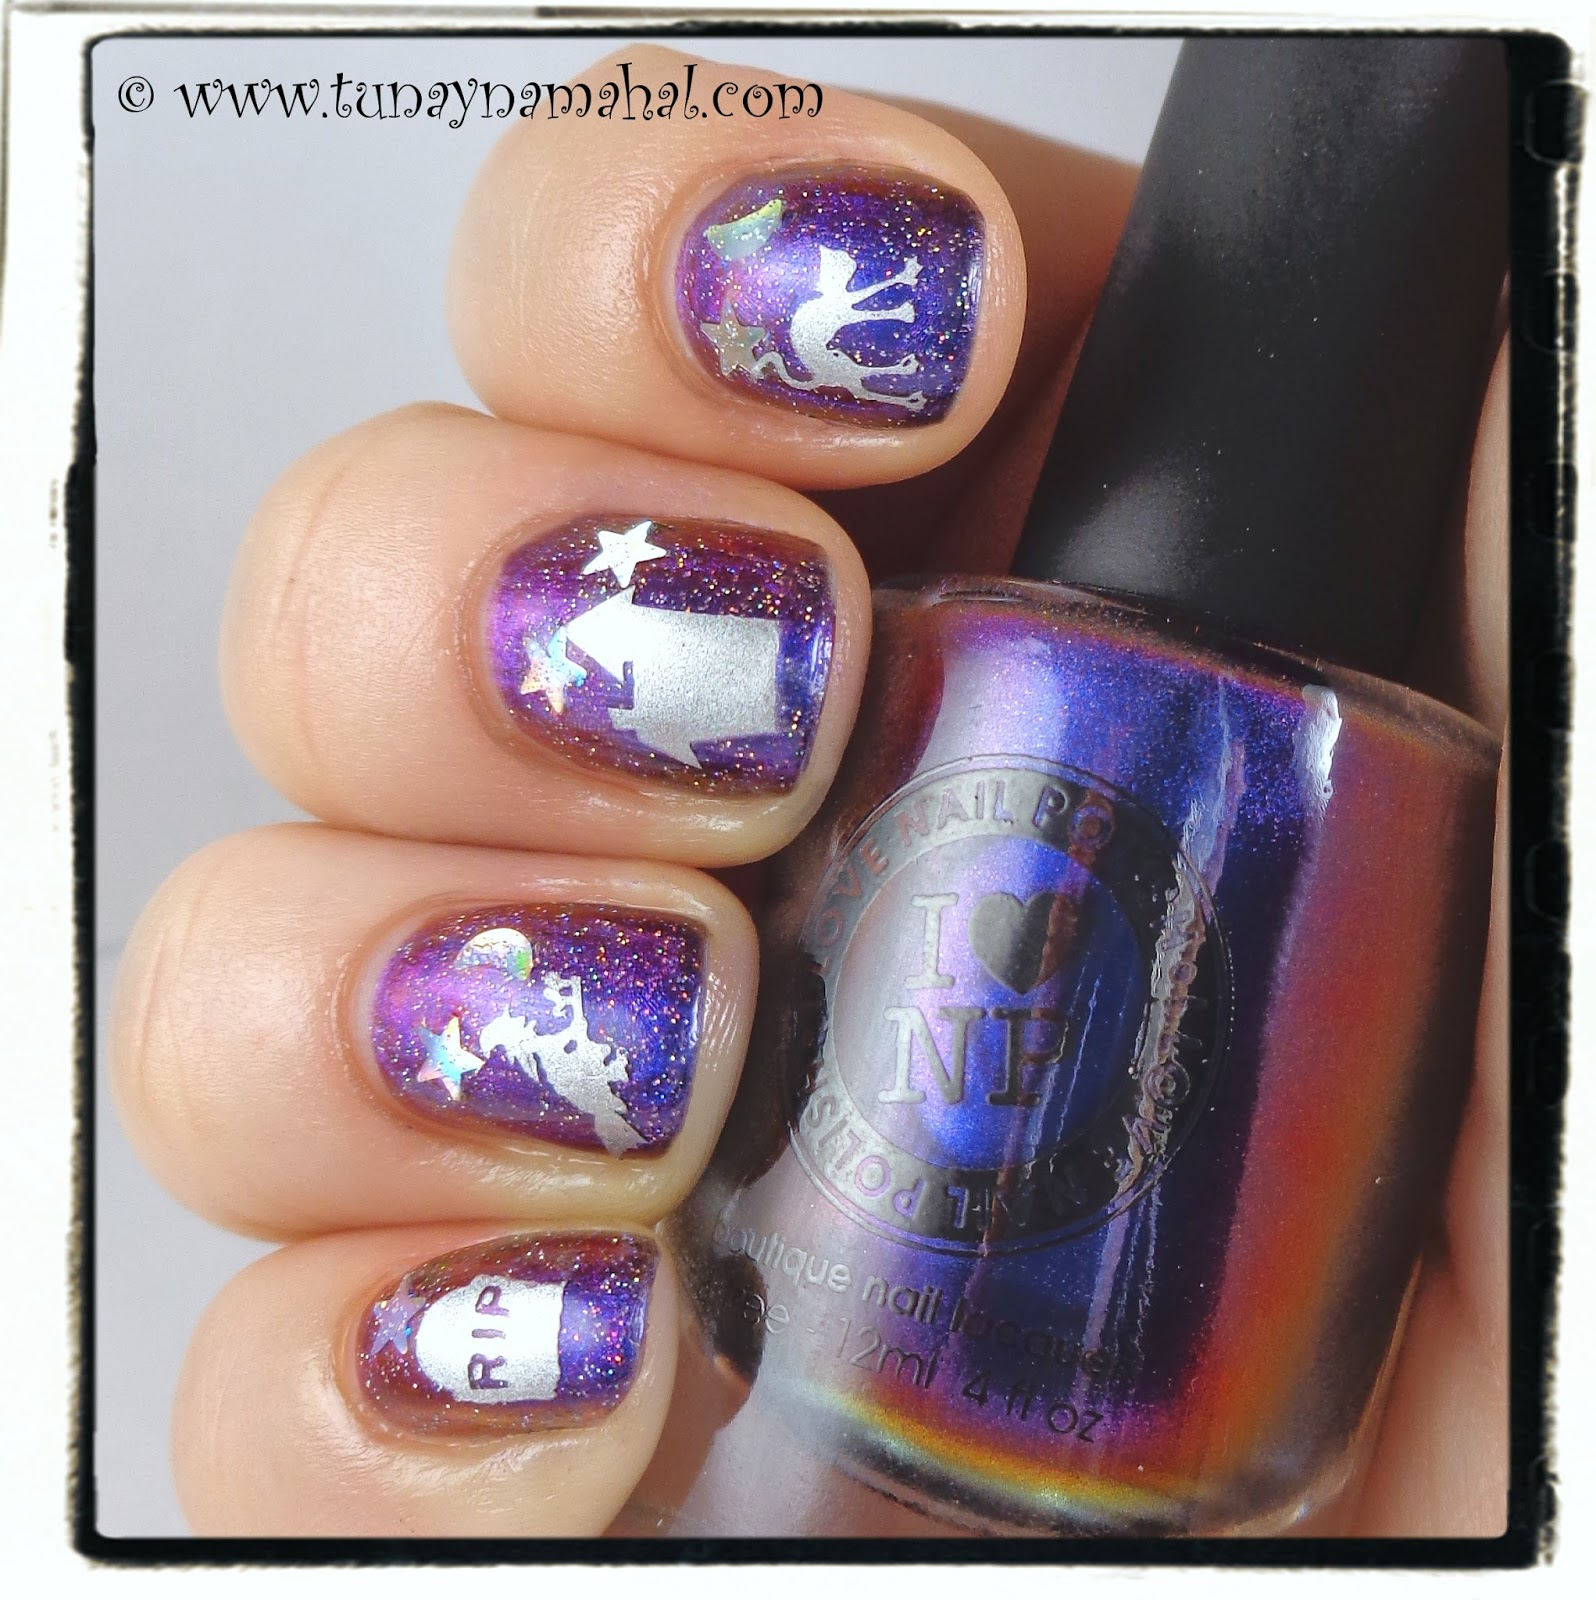 Winstonia & Cygnus Loop Halloween Nails | Tunay Na Mahal